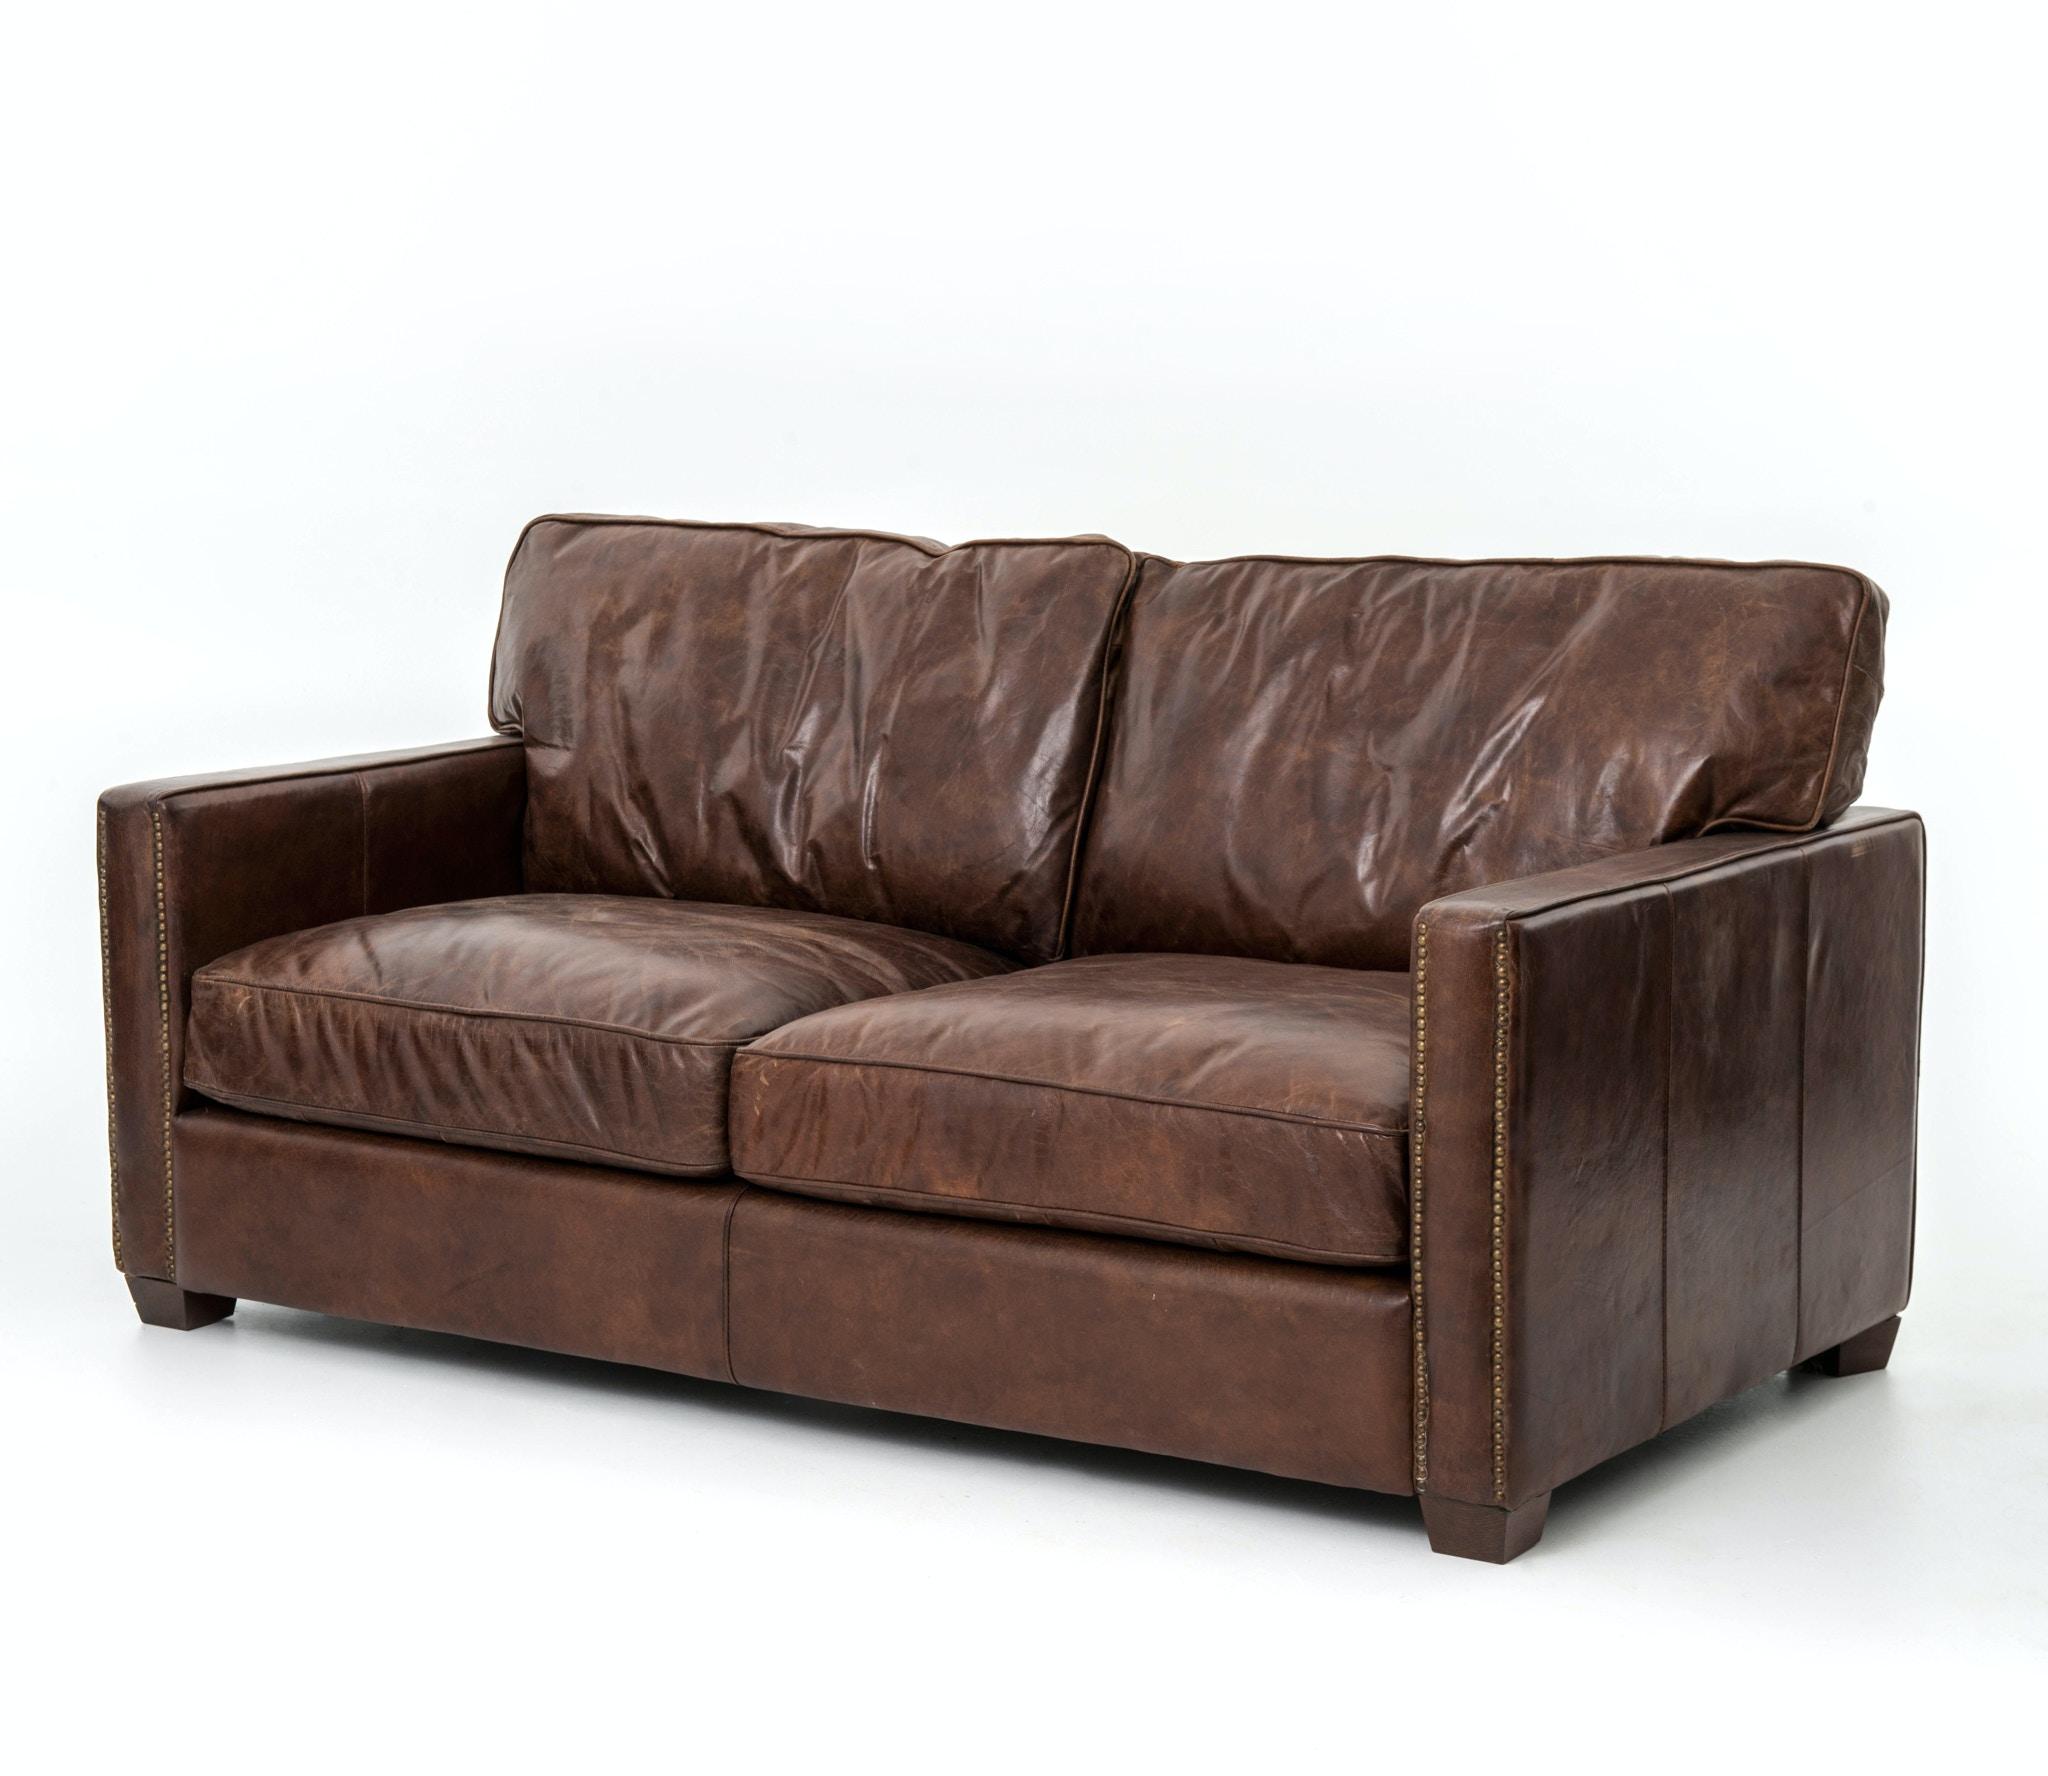 Four Hands Furniture Ccar 24 Living Room Larkin 72 Inch Sofa Cigar